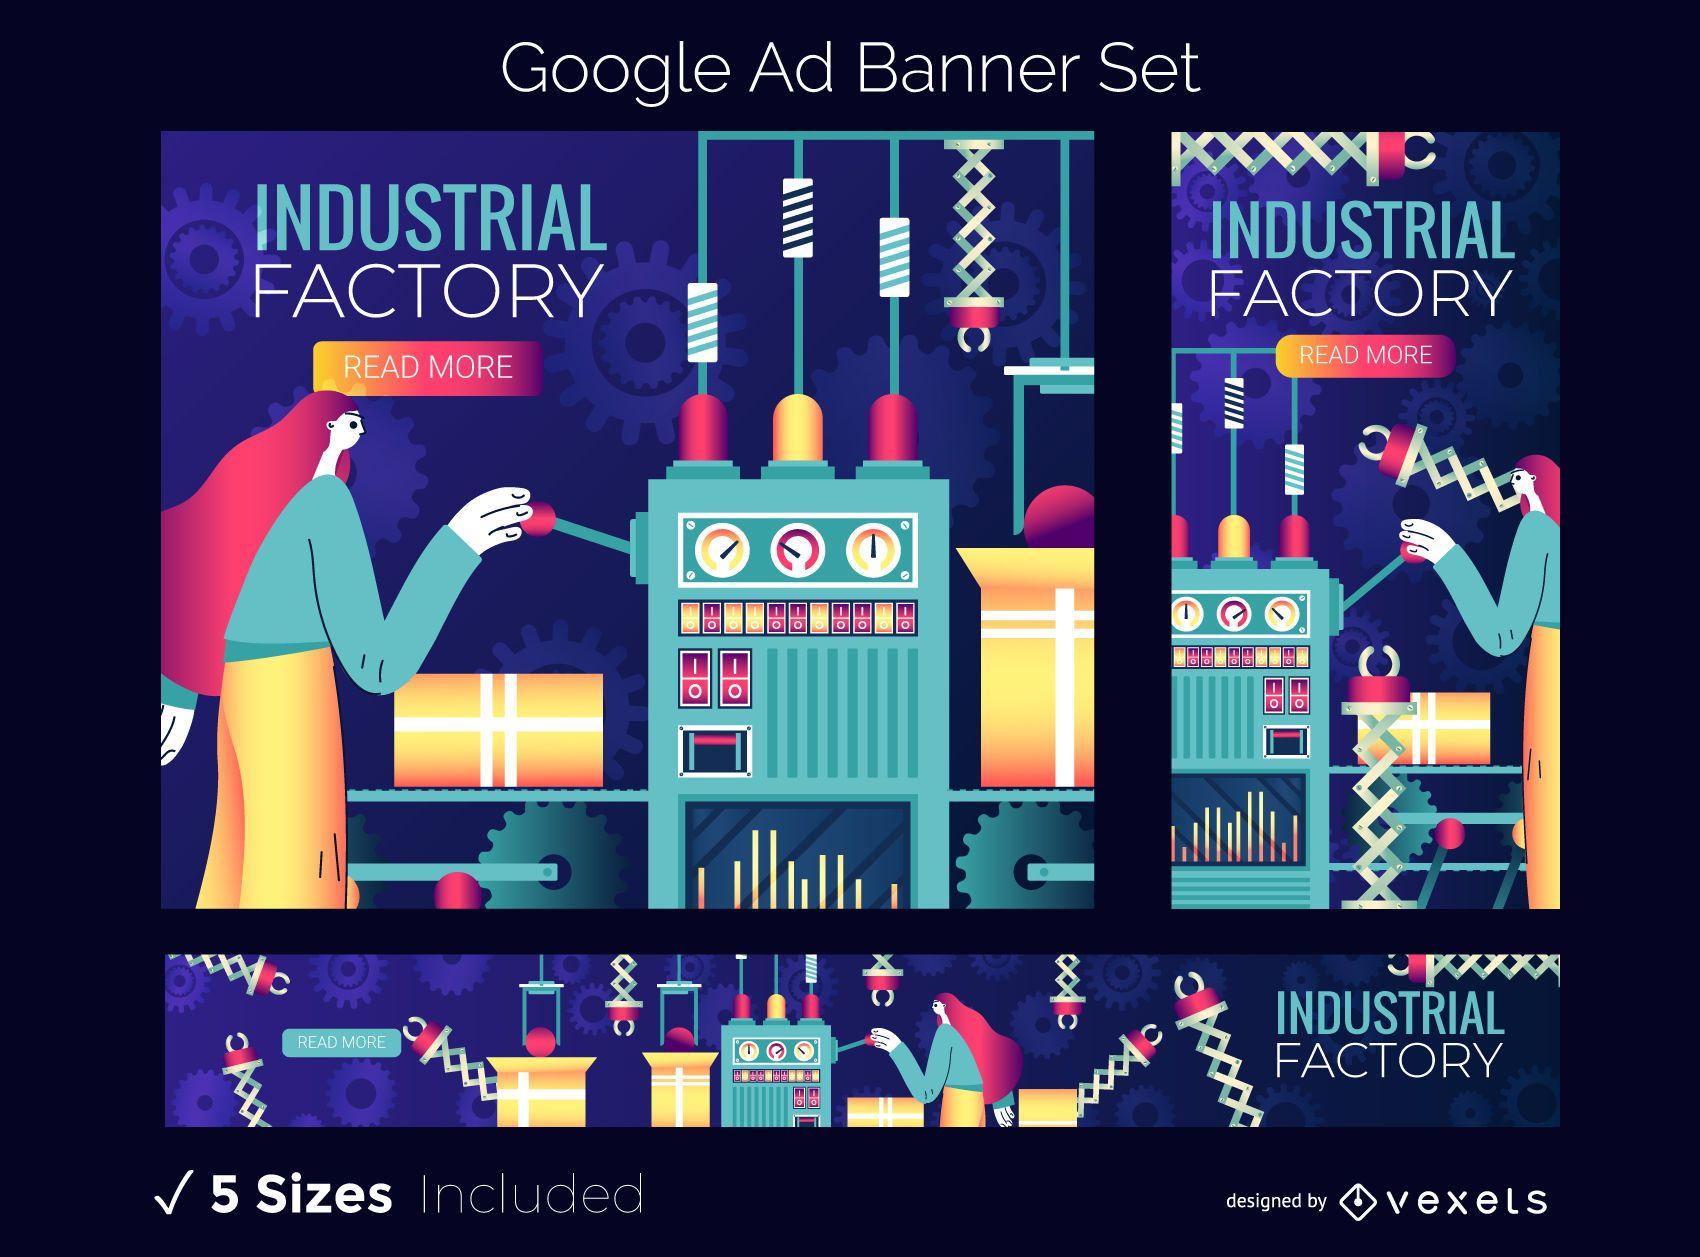 Conjunto de banners do Google Ads para fábrica industrial